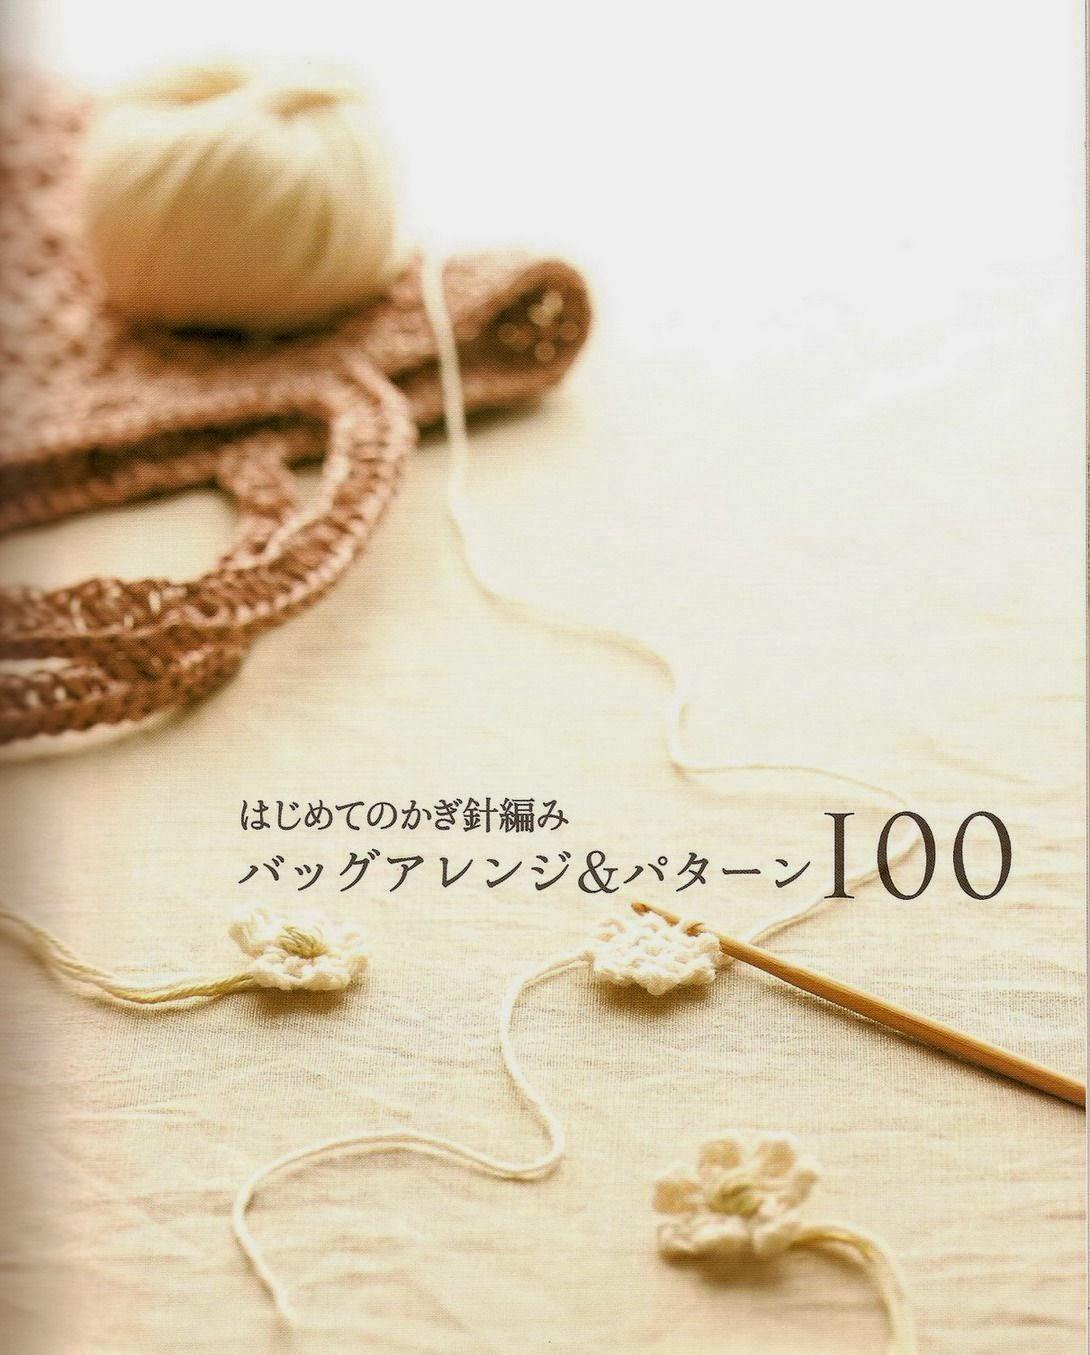 Handmade bằng len: Ebook 24 - Hướng dẫn móc túi len